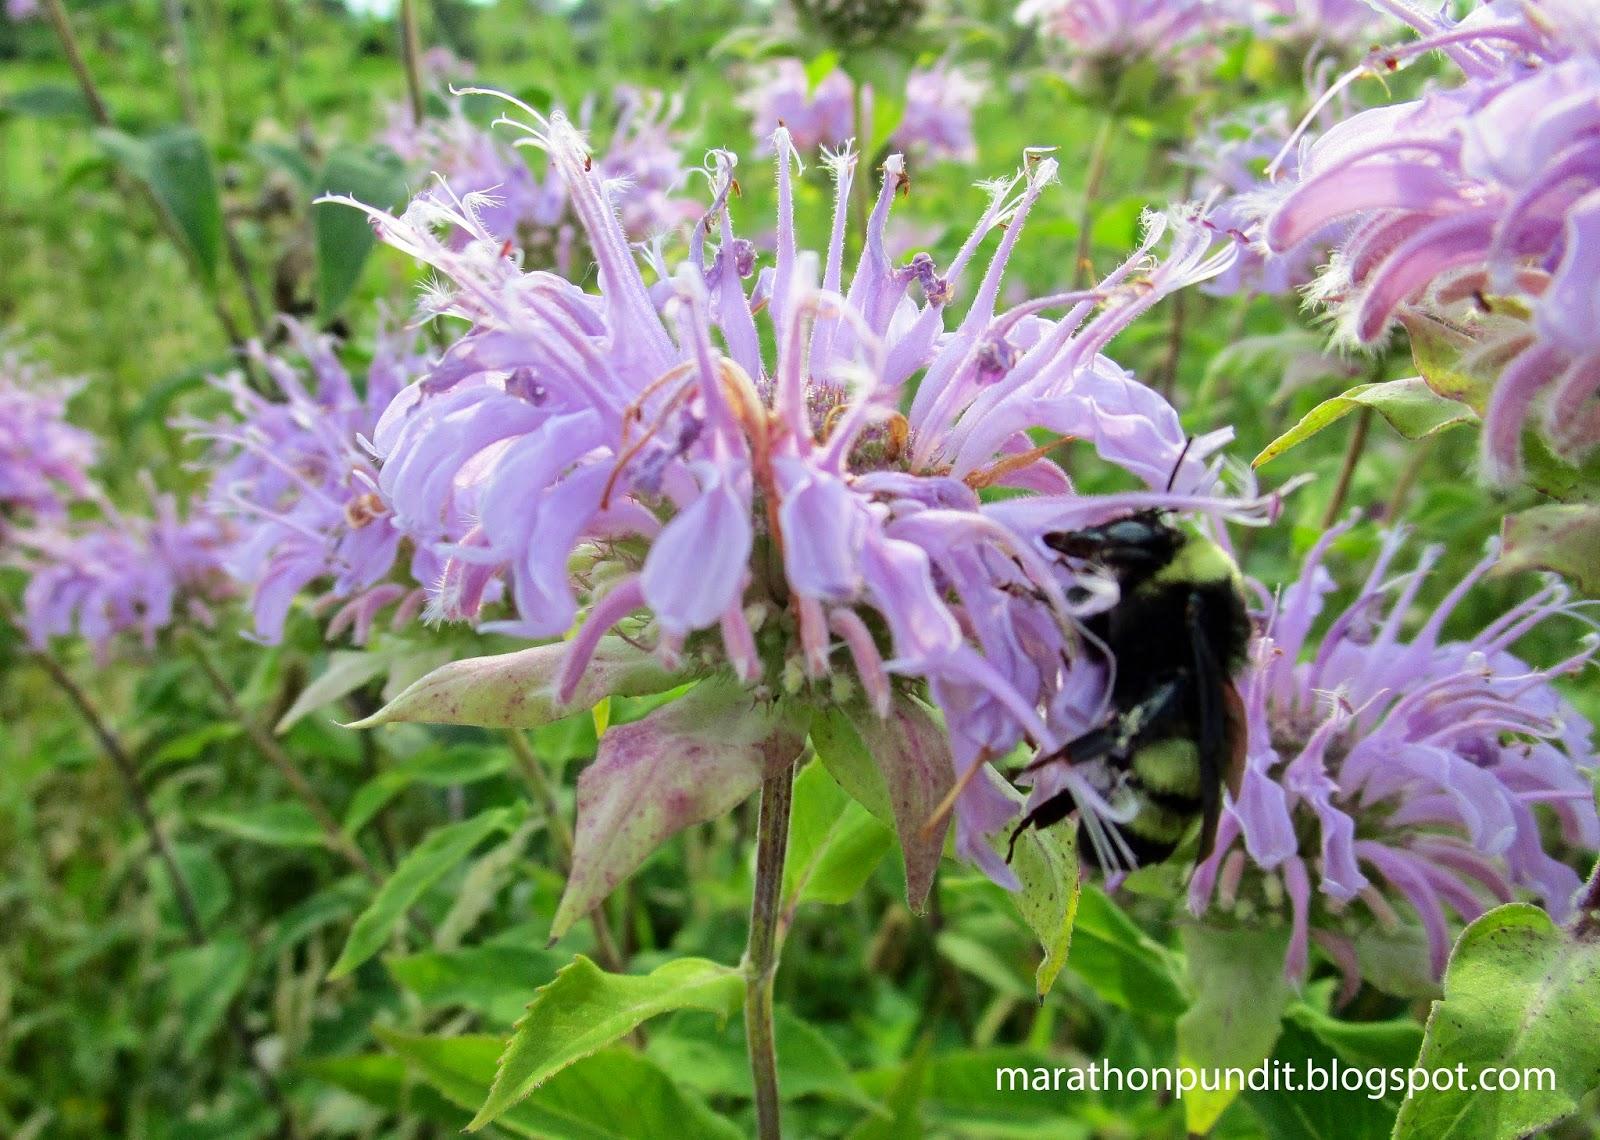 Marathon Pundit: Wild bergamot and a bumblebee